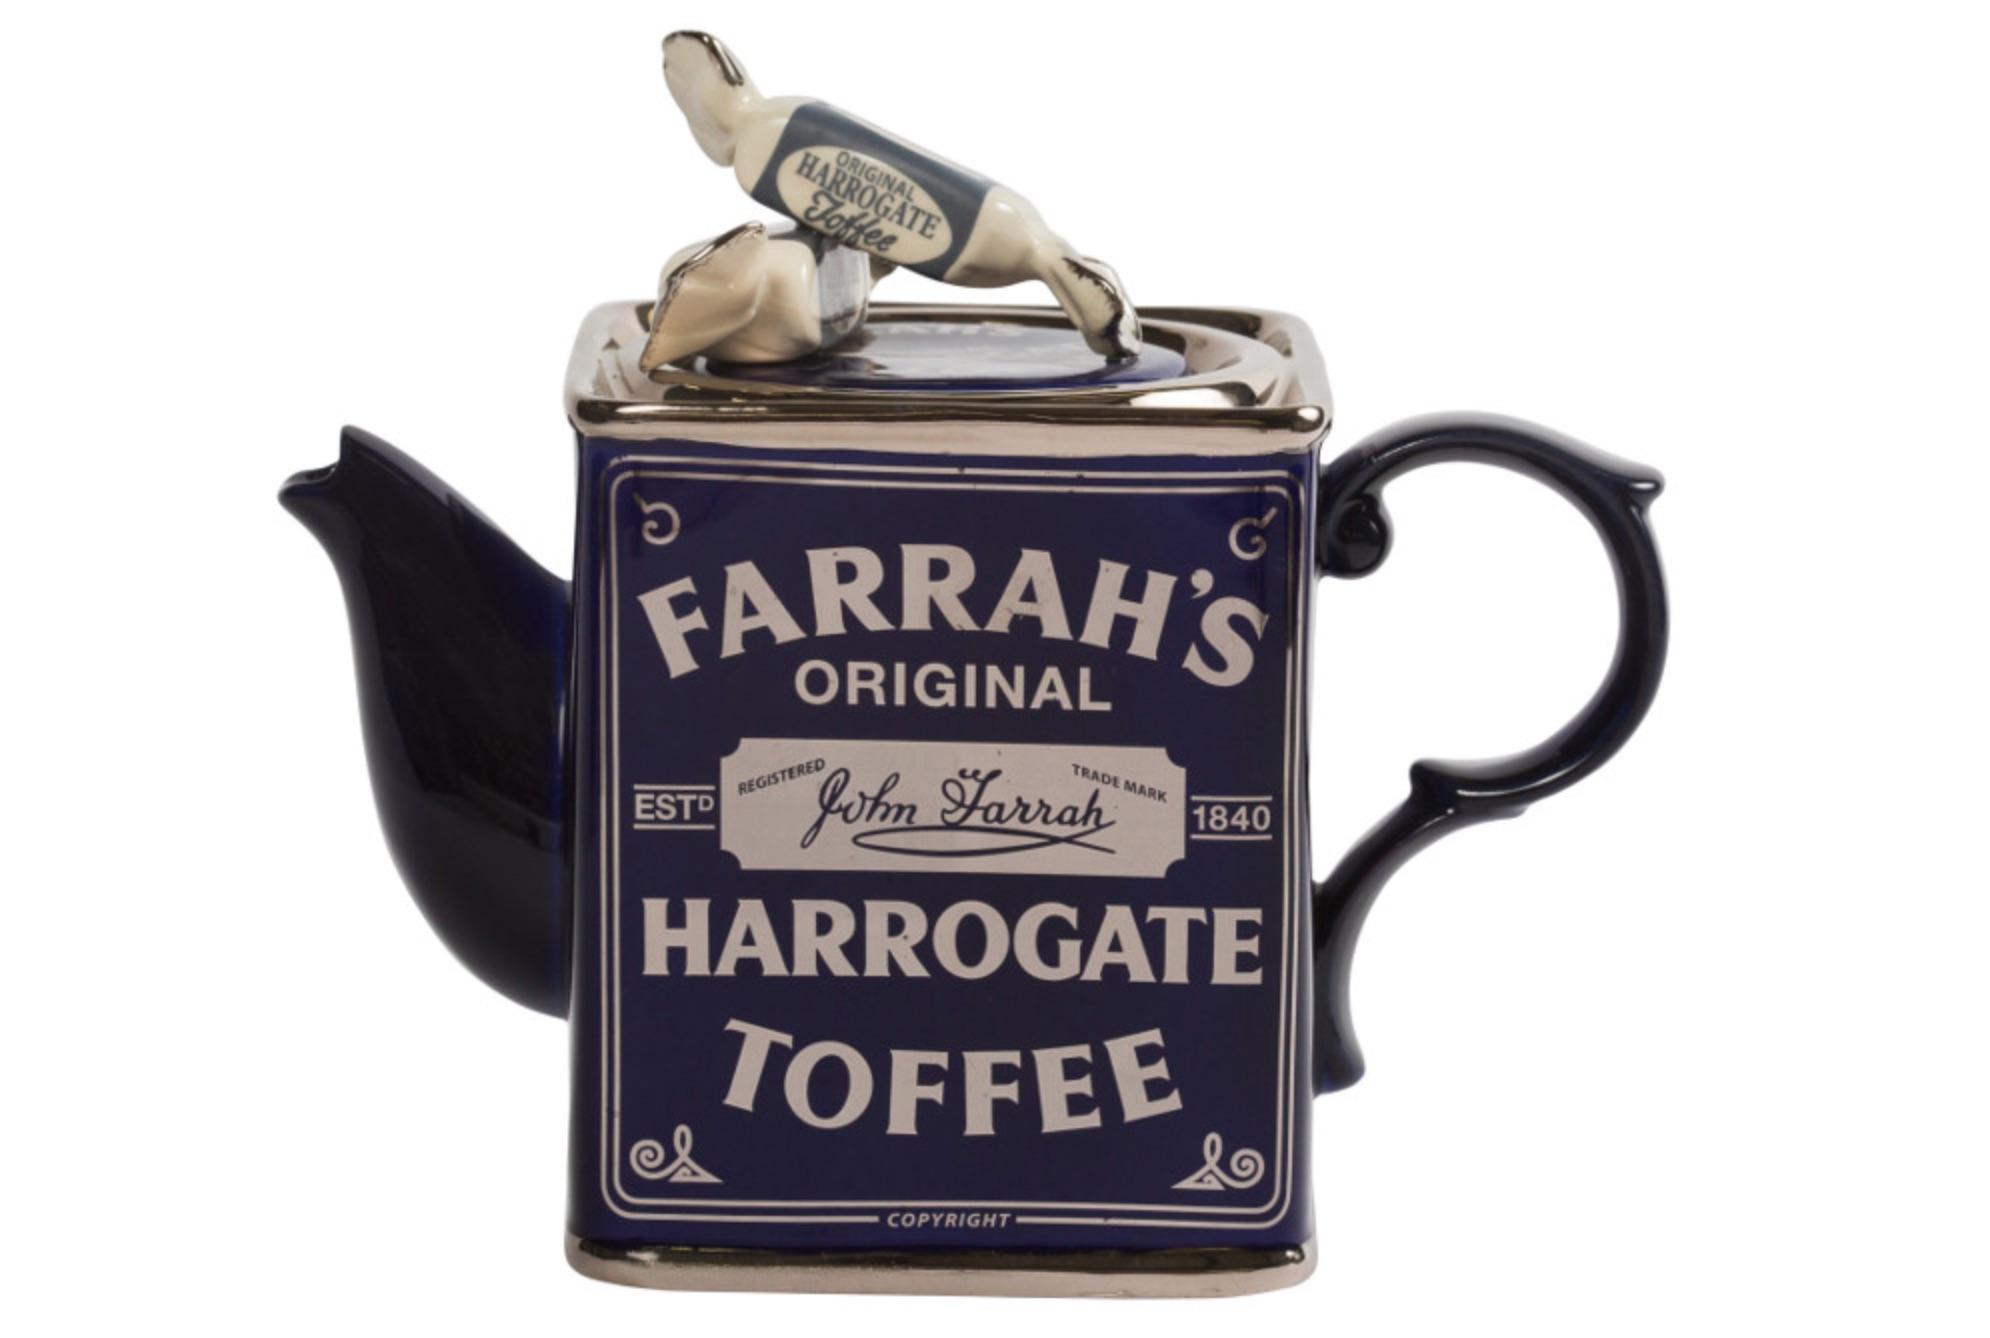 farrah's harrogate toffee novelty teapot